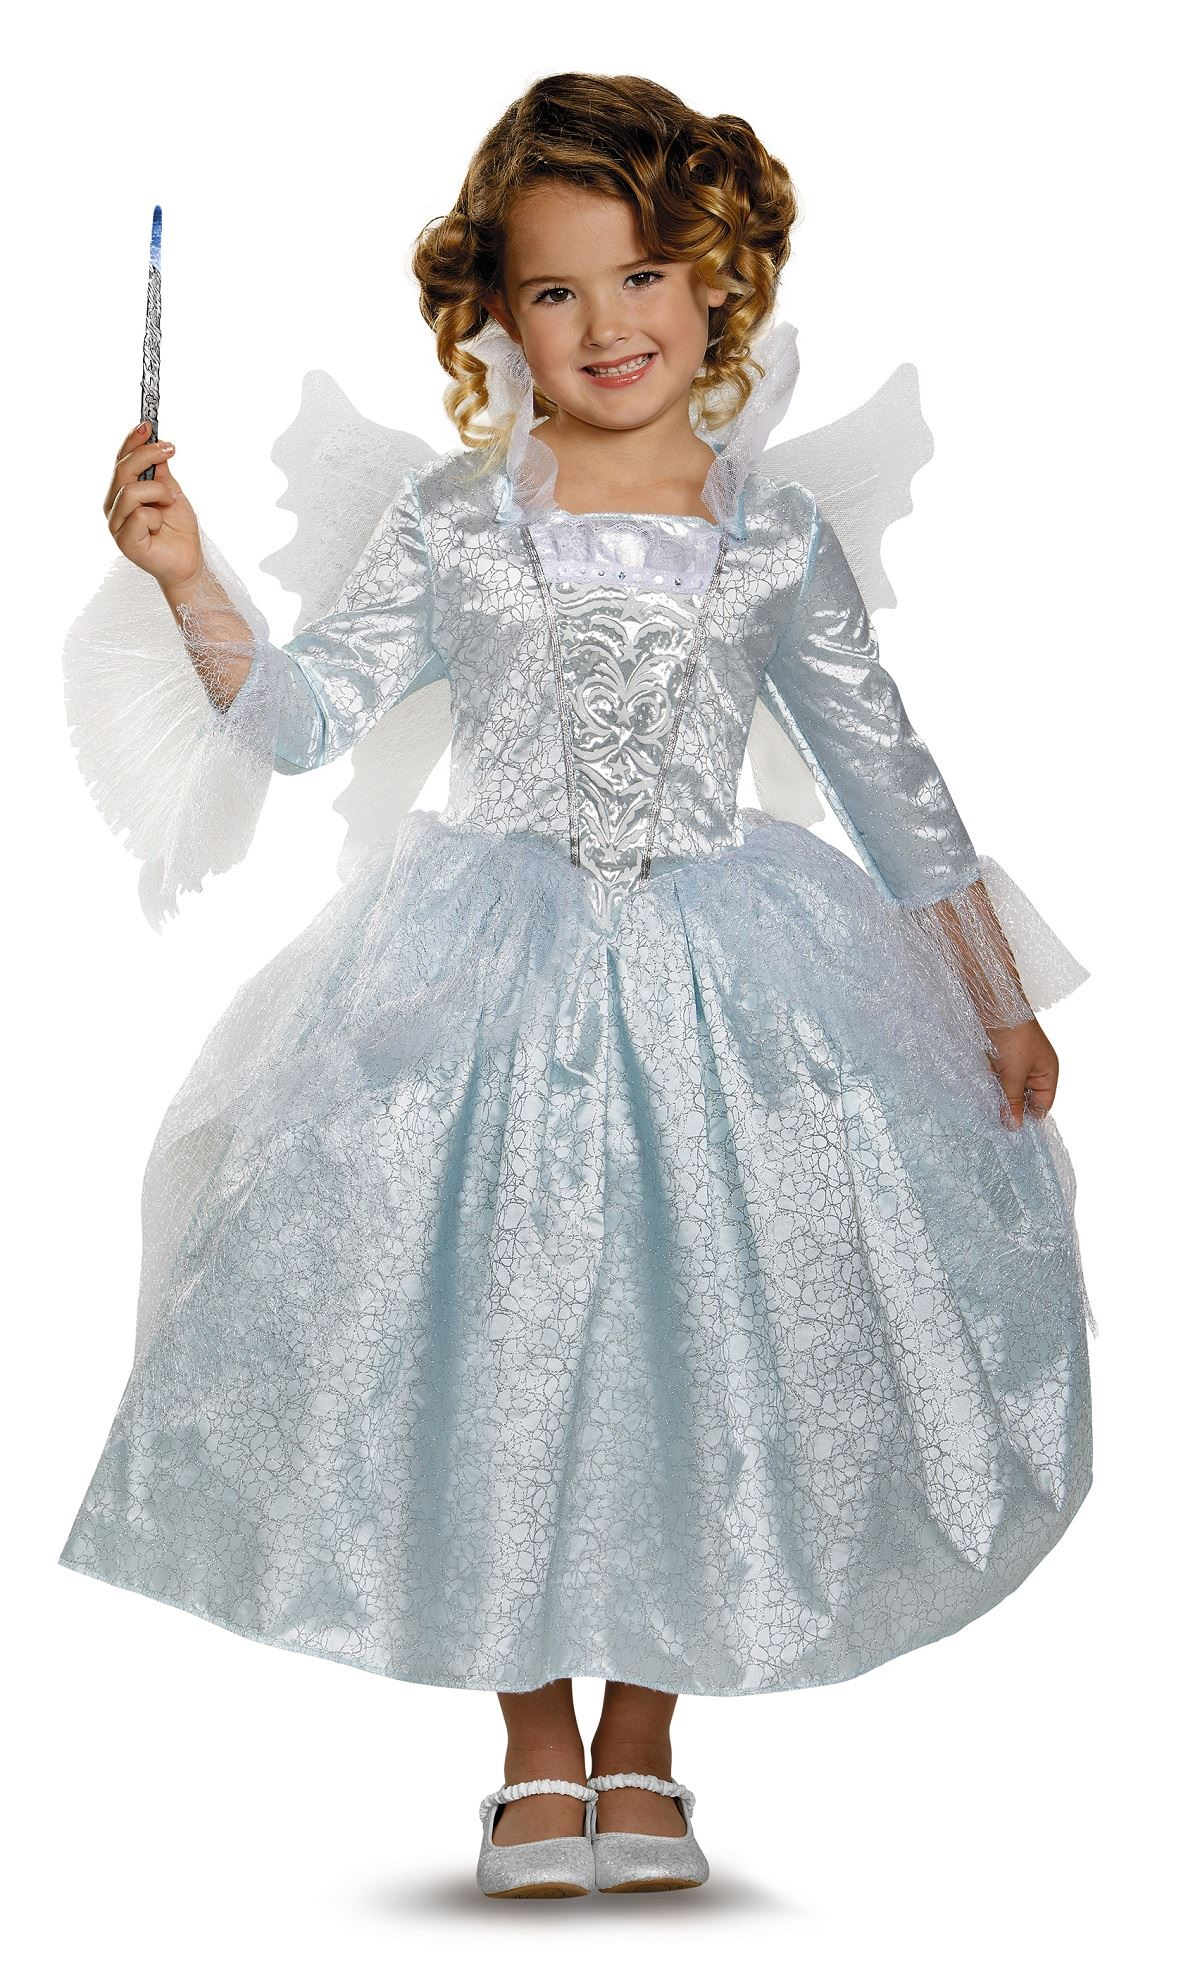 Kids Fairy Godmother Cinderella Girls Costume ...  sc 1 st  The Costume Land & Kids Fairy Godmother Cinderella Girls Costume | $41.99 | The Costume ...